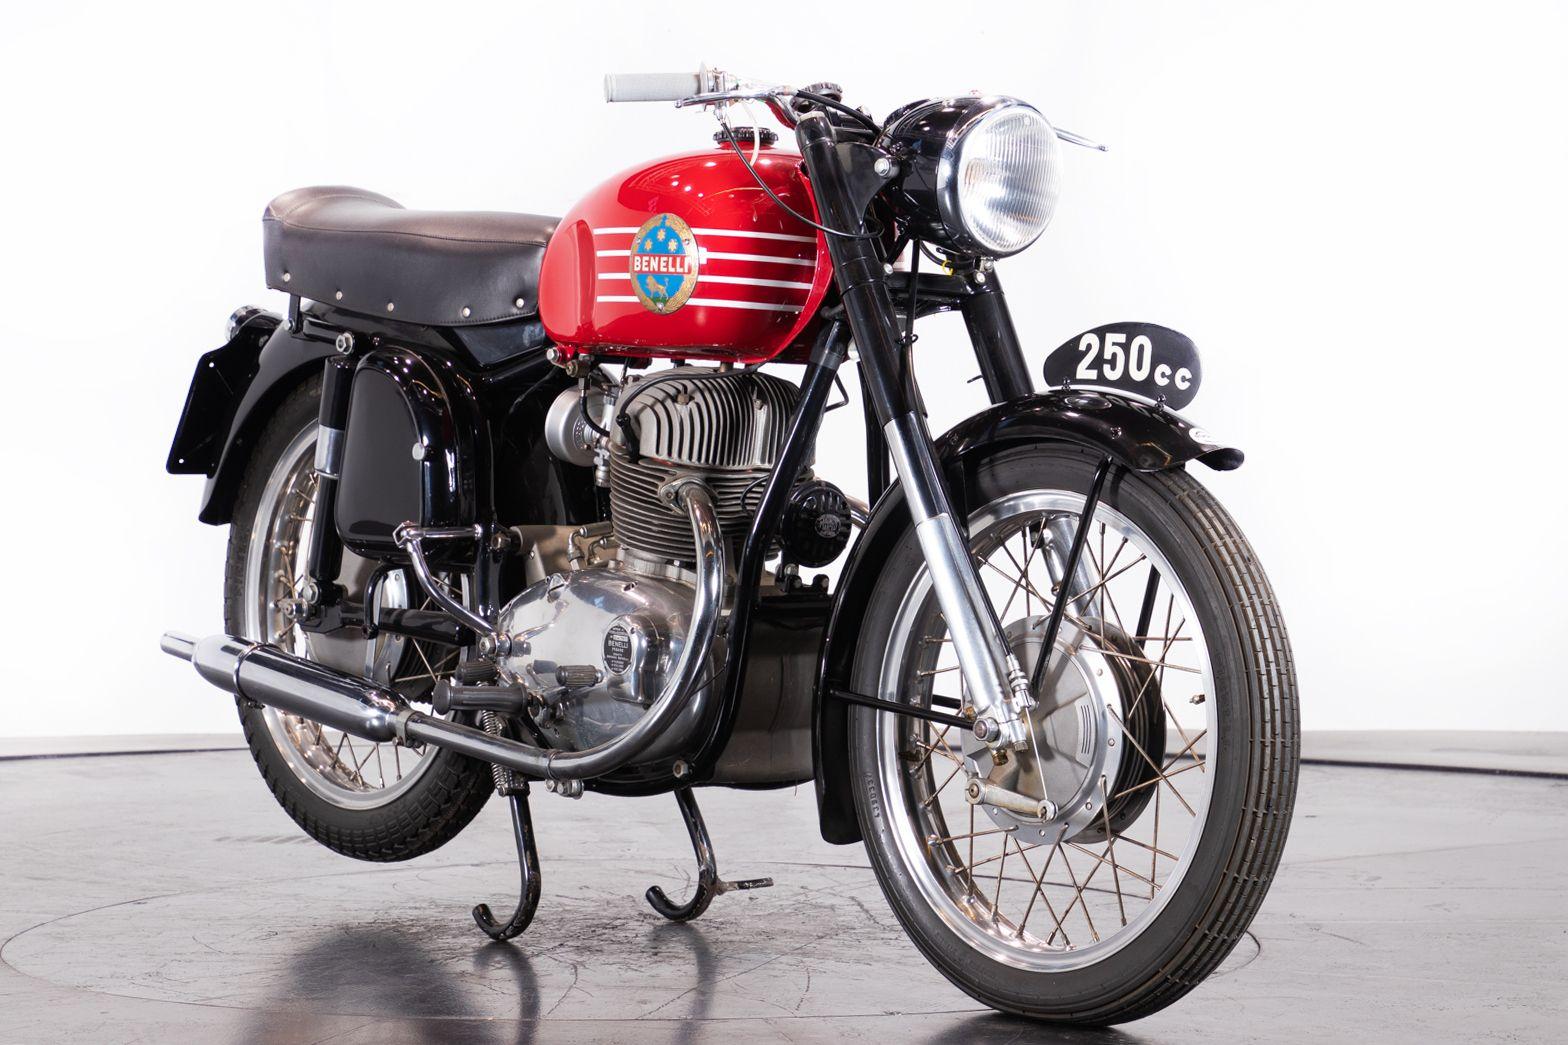 1955 Benelli 250 Leonessa 74308